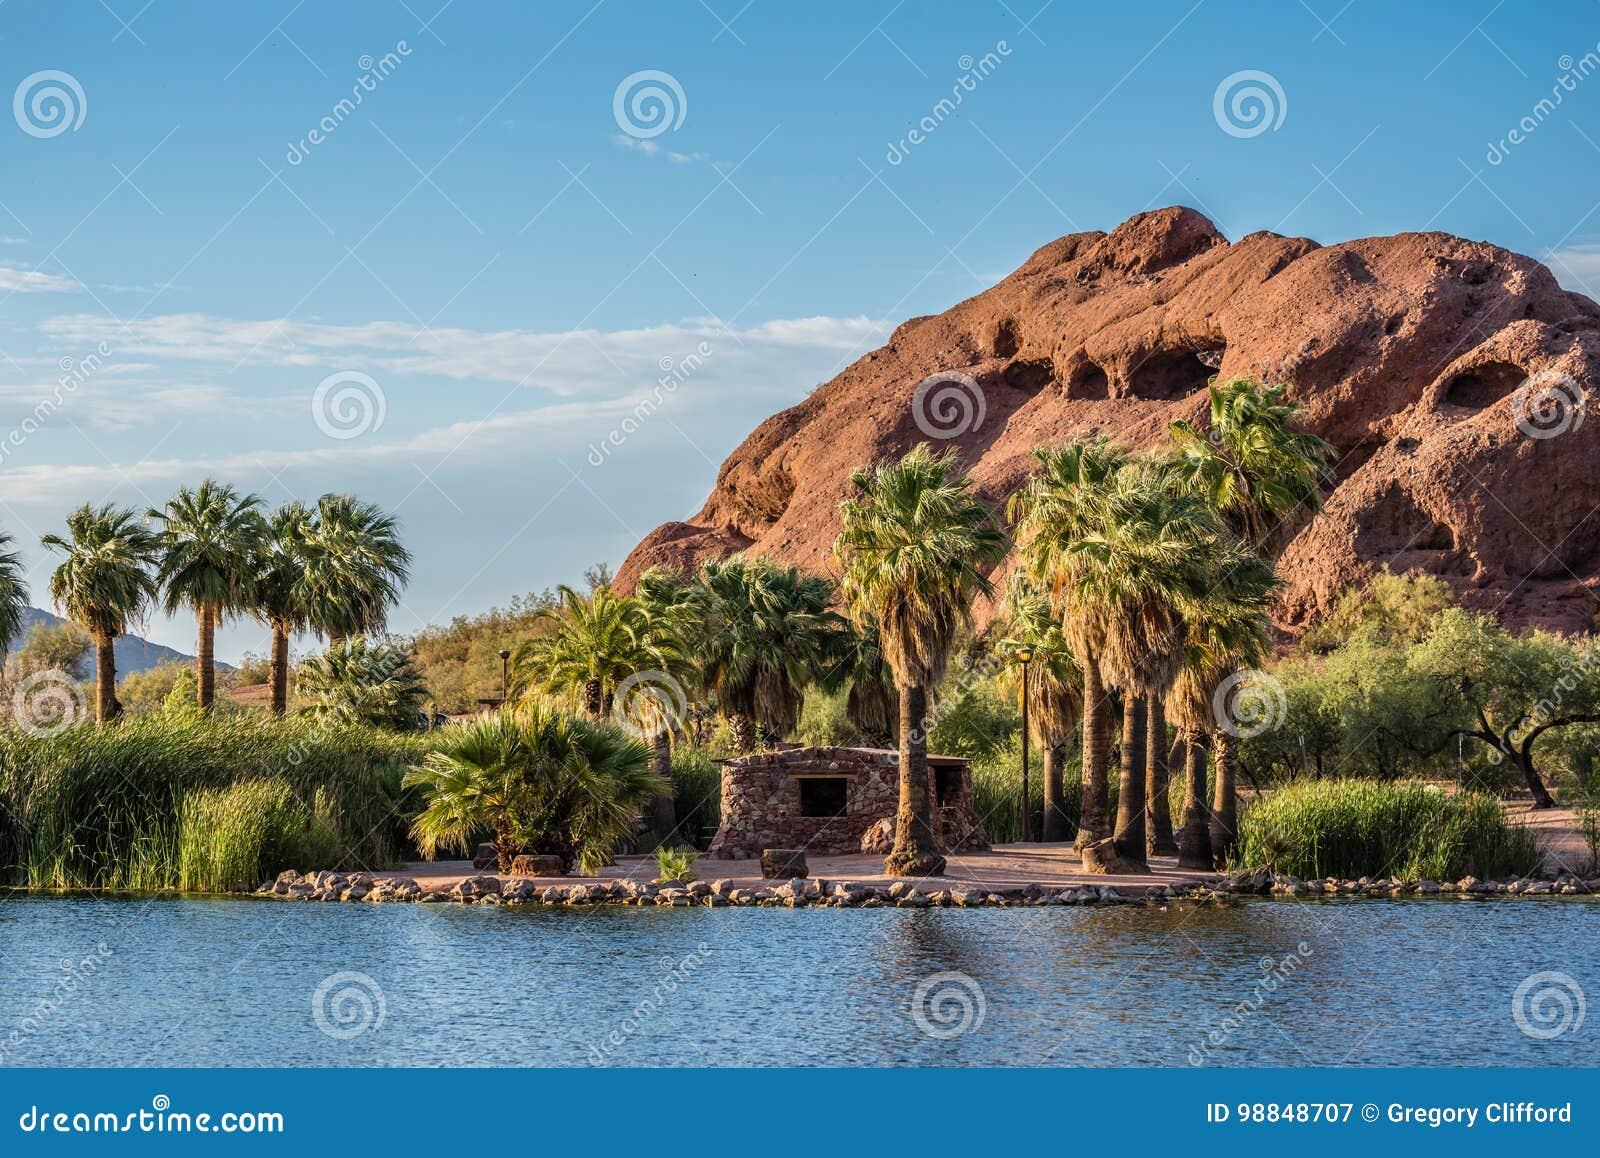 Papago Park Ramada stock image. Image of america, mountain - 98848707